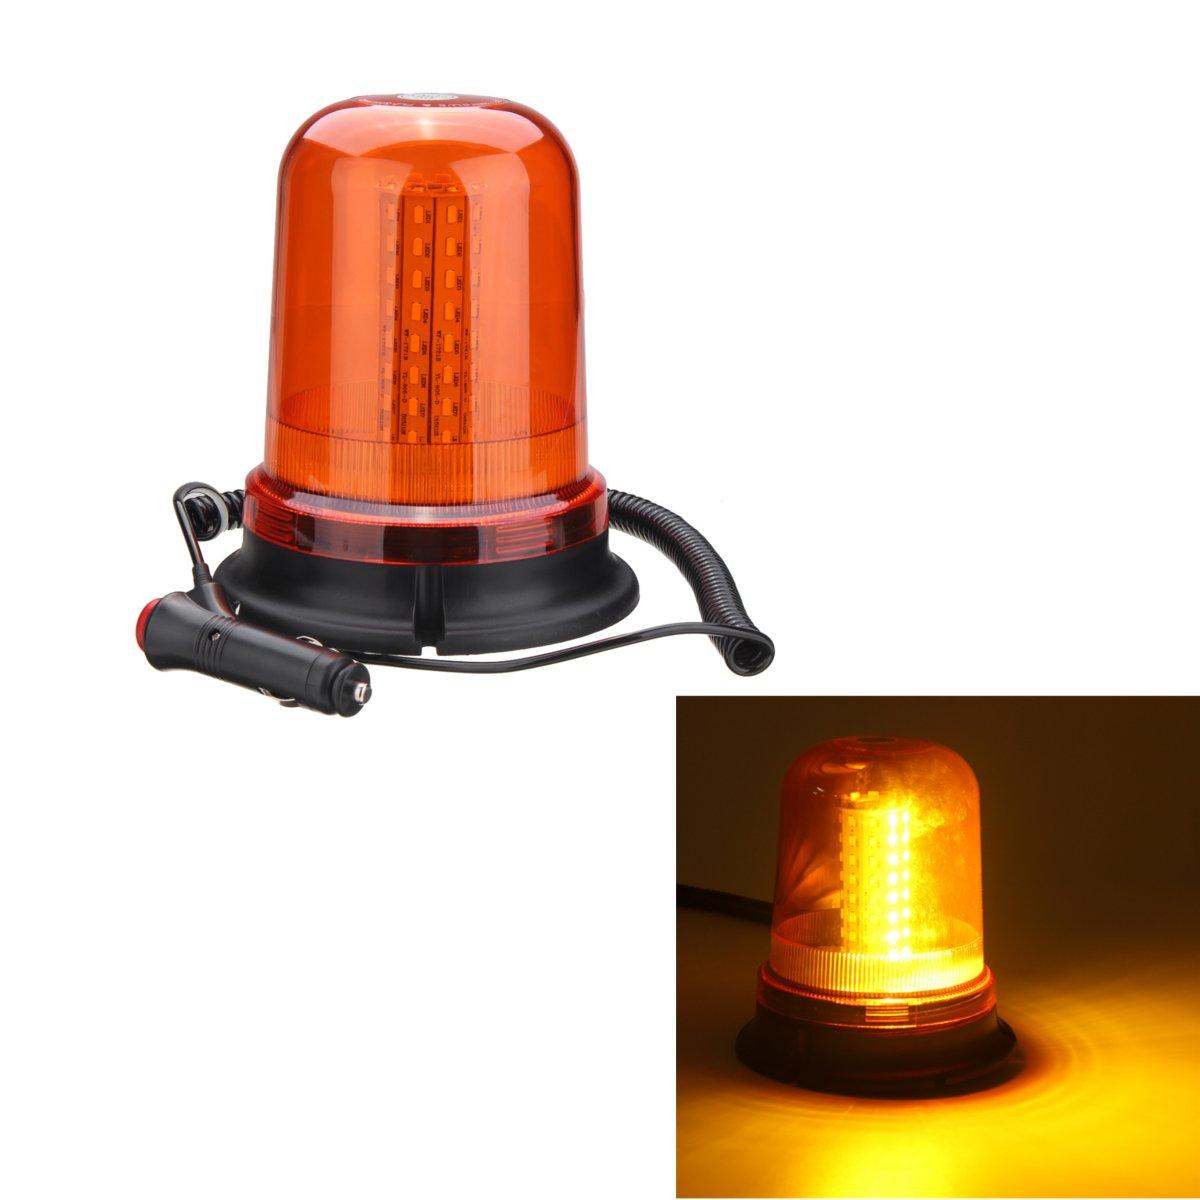 12-24V 80 LED Magnetic Mount Rotating Flashing Amber Dome Beacon Recovery Warning Light addi 12 80